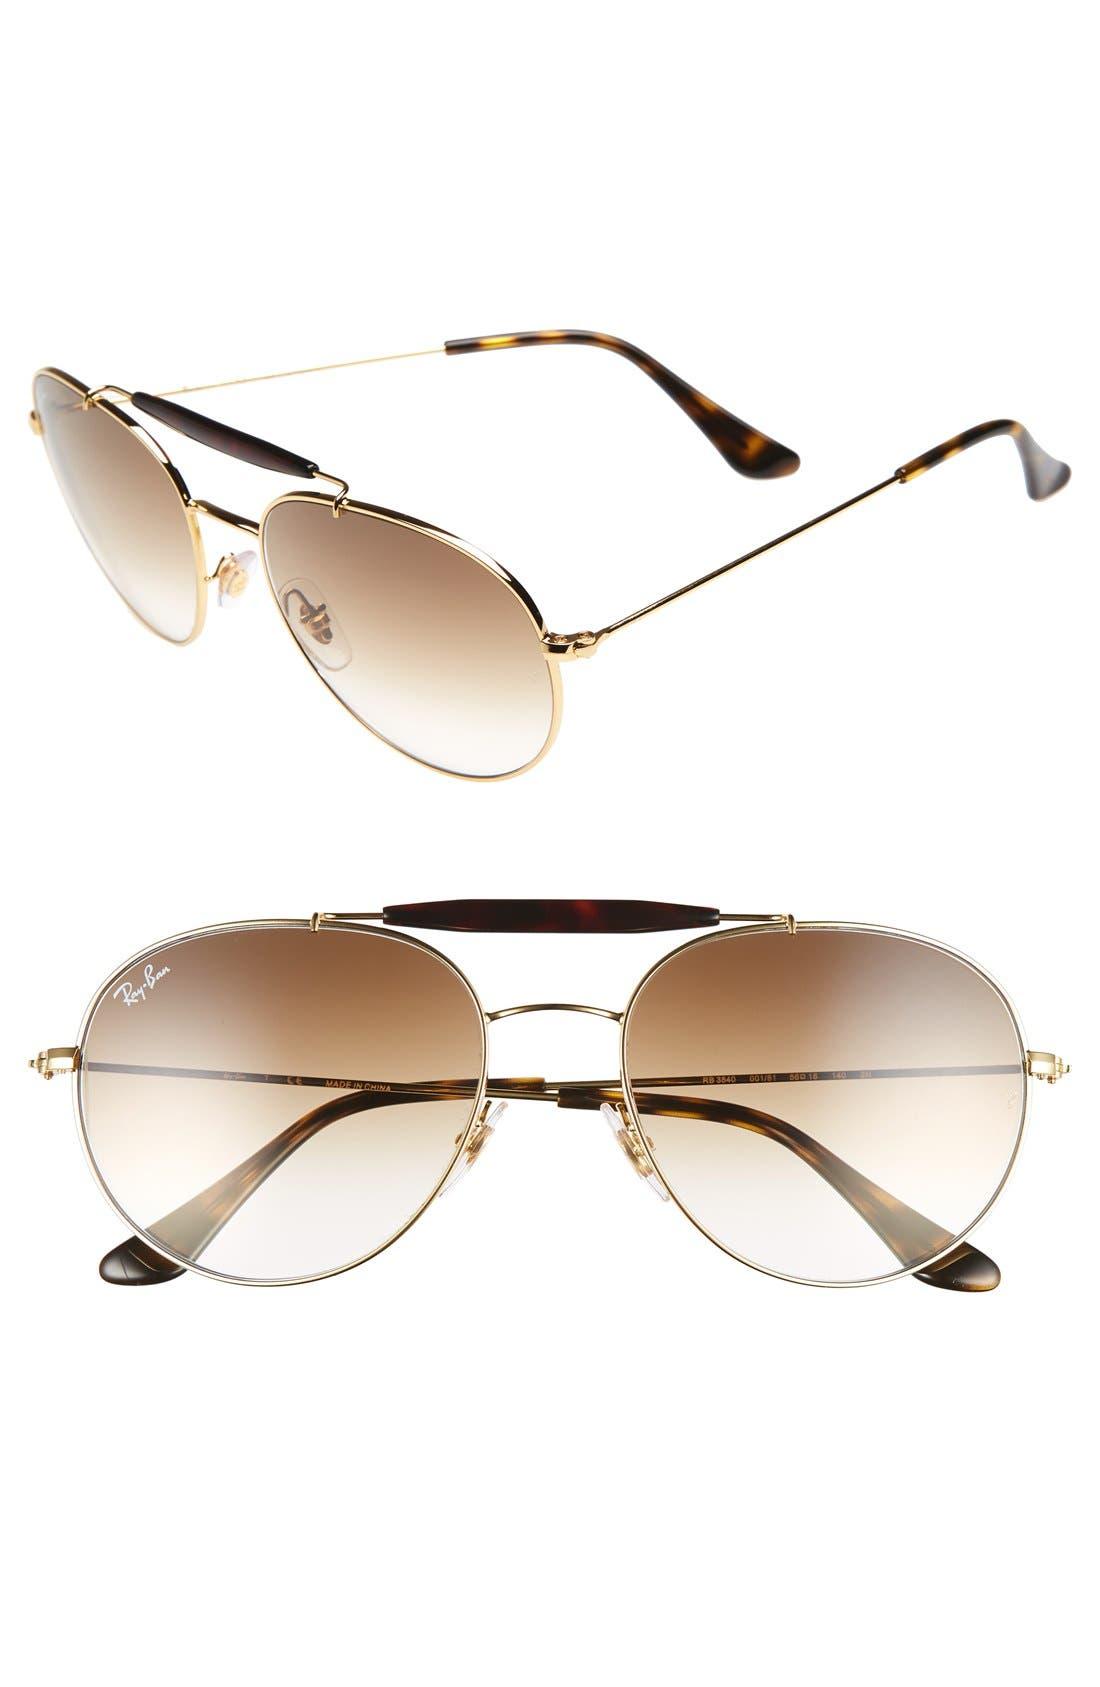 Main Image - Ray-Ban Highstreet 56mm Sunglasses